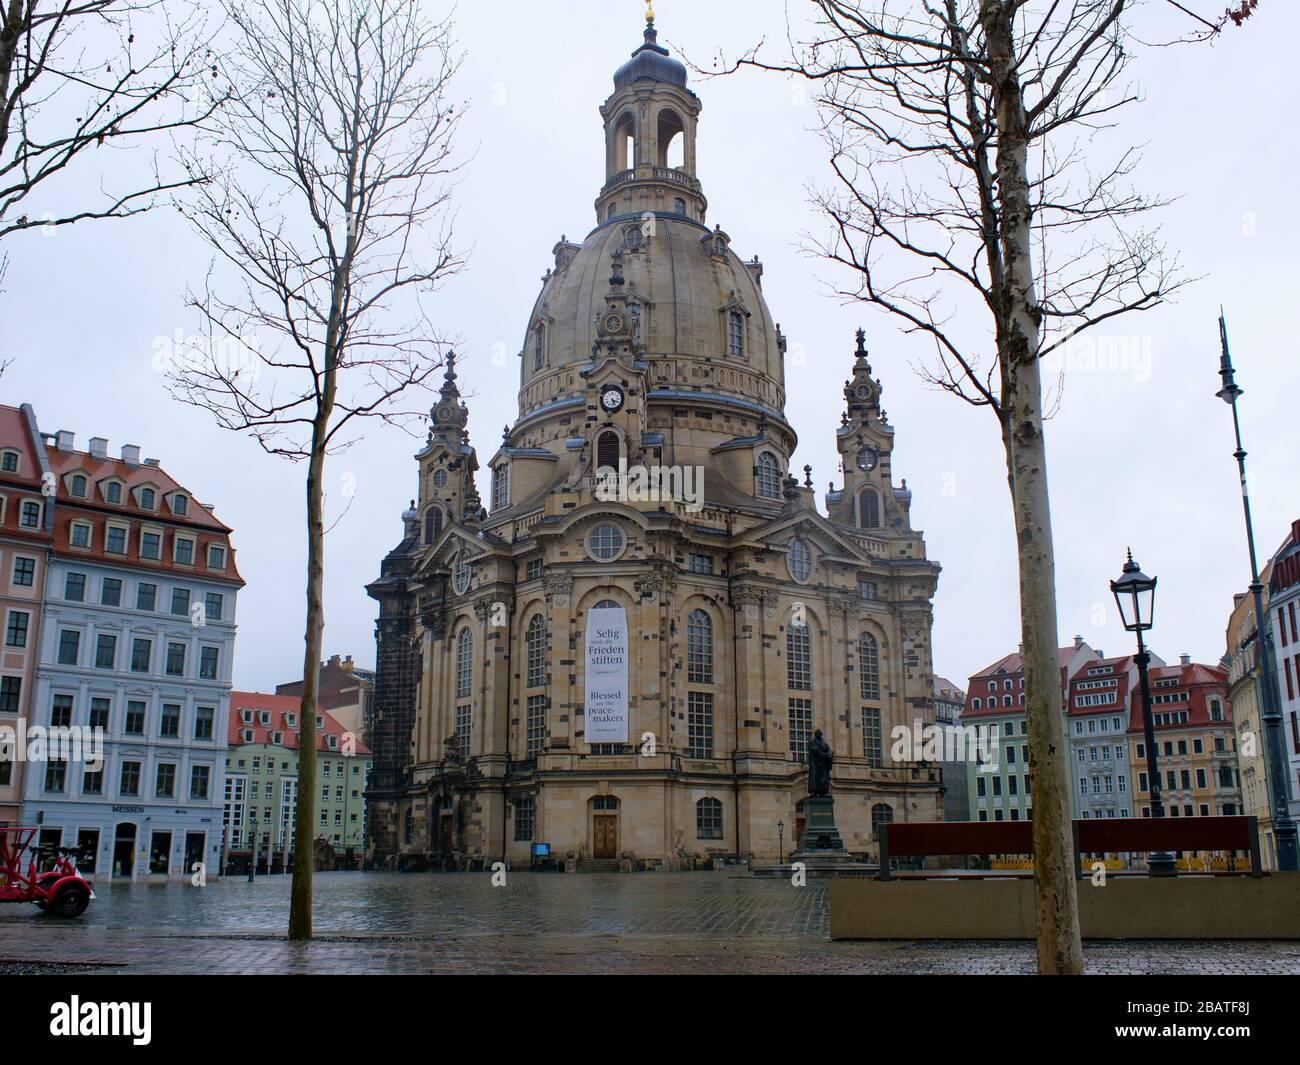 Dresden Frauenkirche während coronavirus Leerer Neumarkt Tourismus Corona Lockdown virus Ausgangssperre Kontaktsperre Banque D'Images